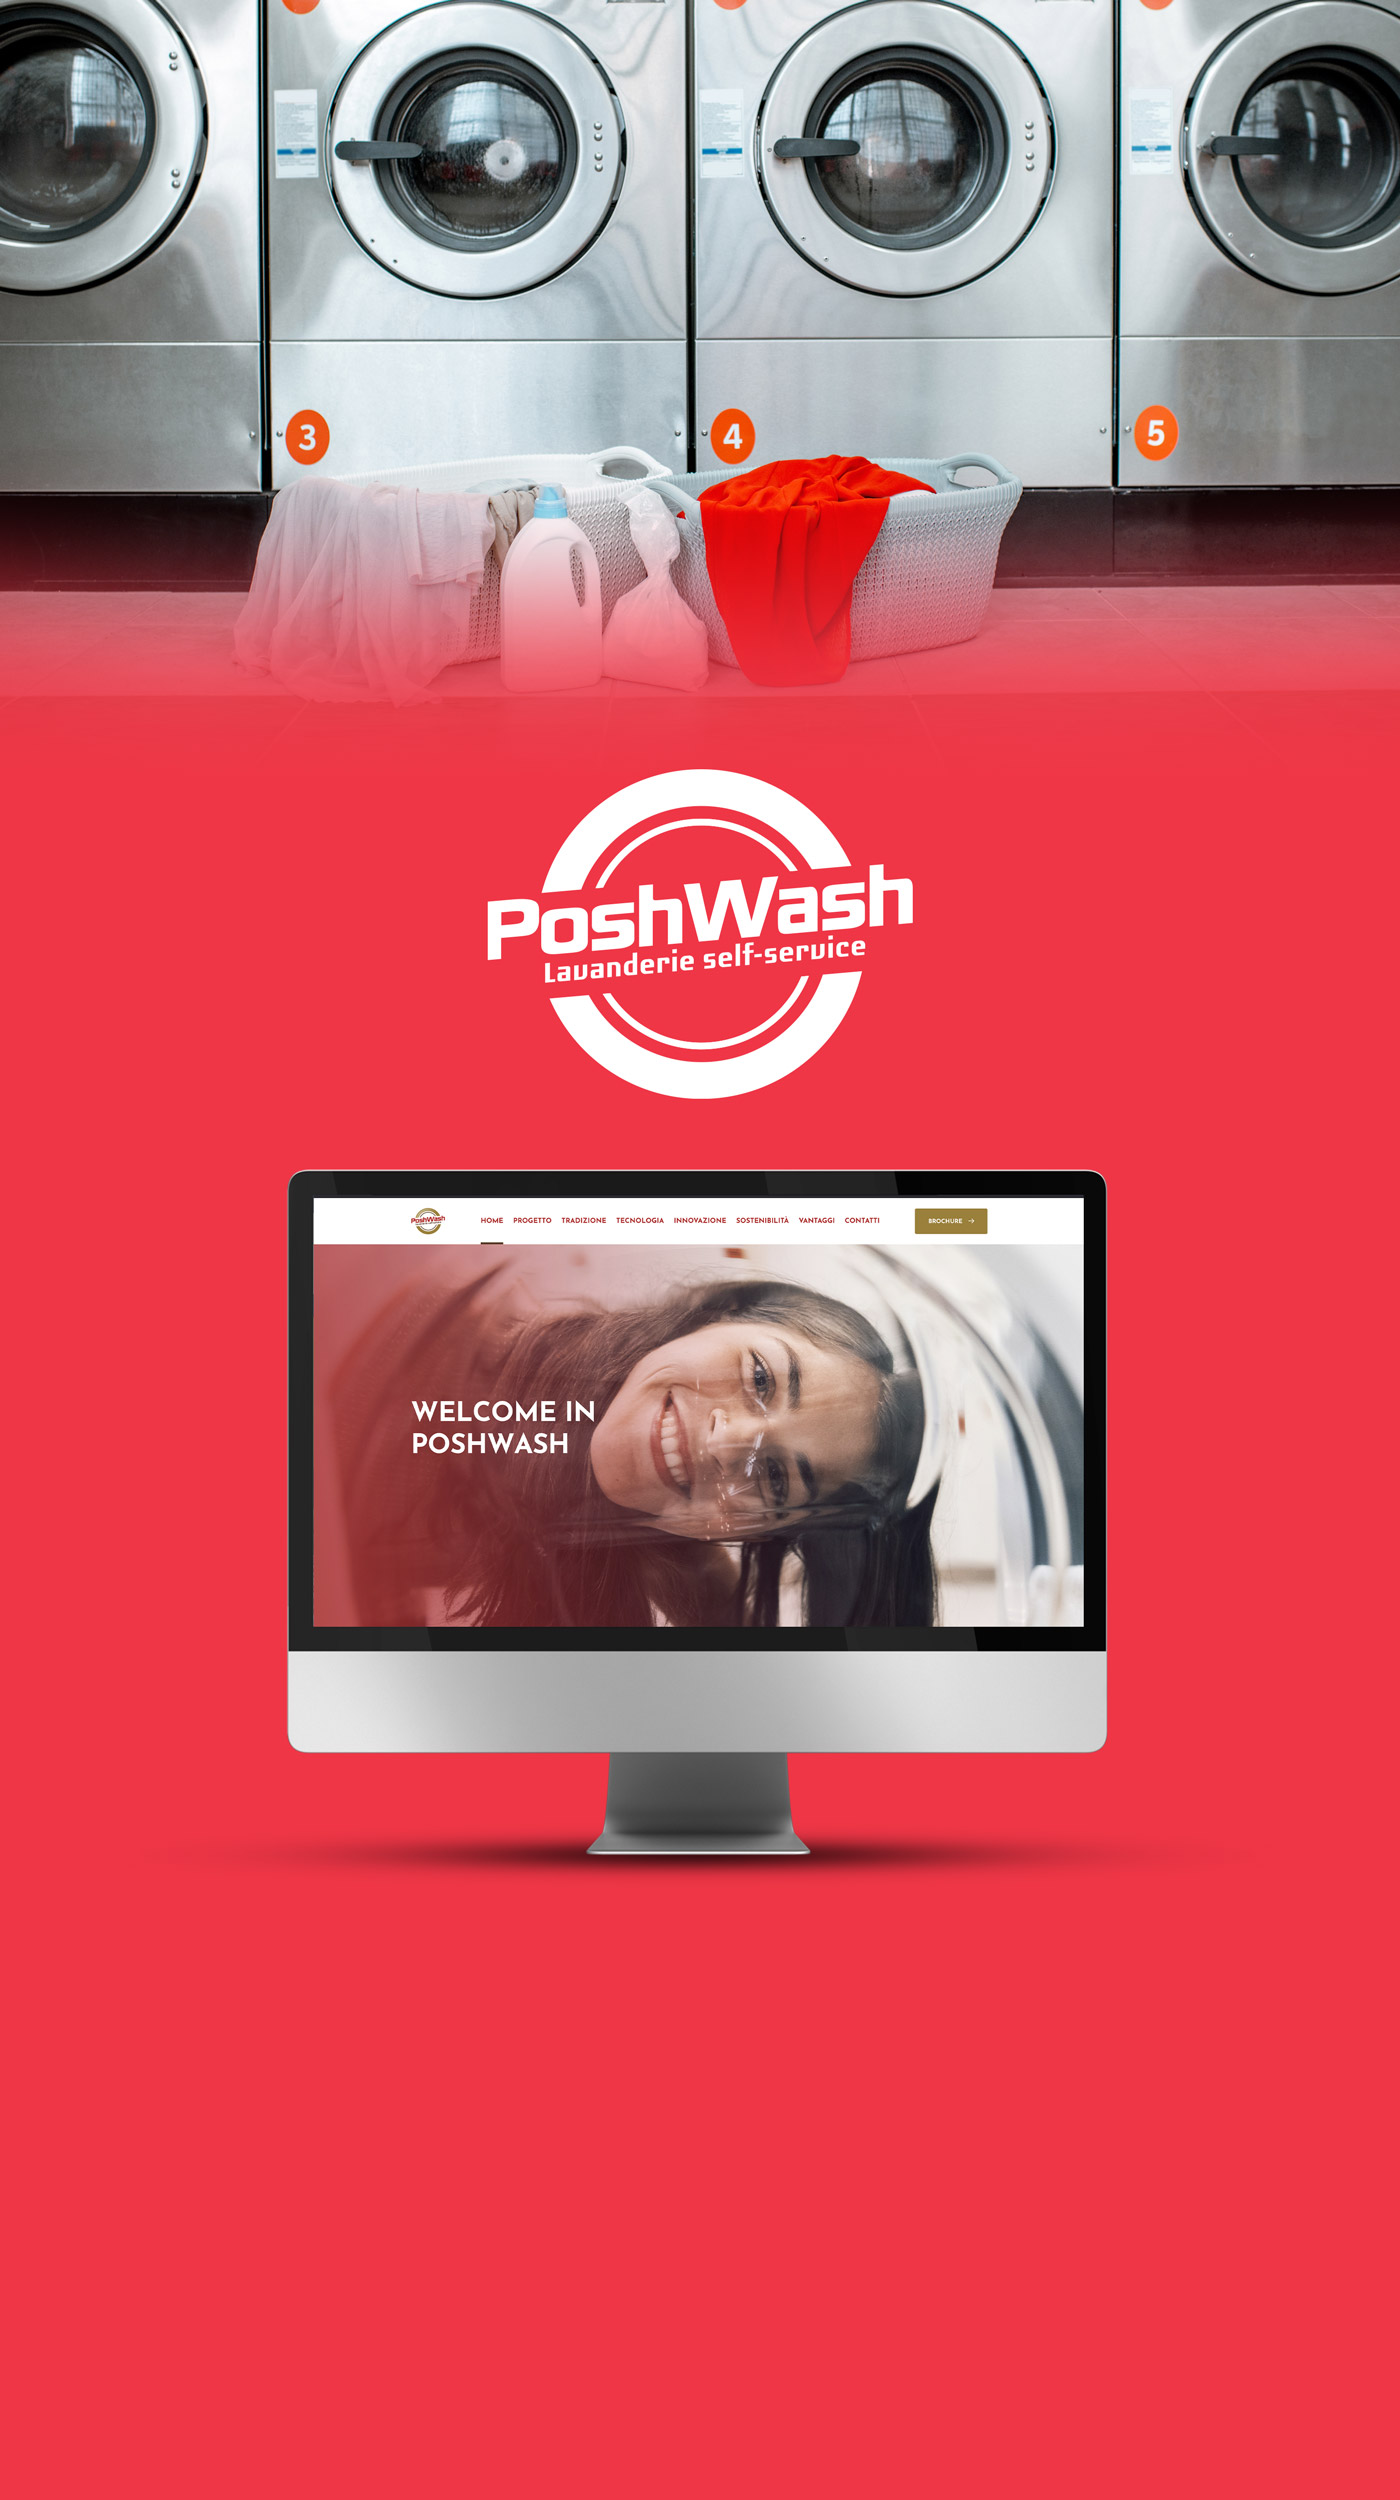 poshwash-web